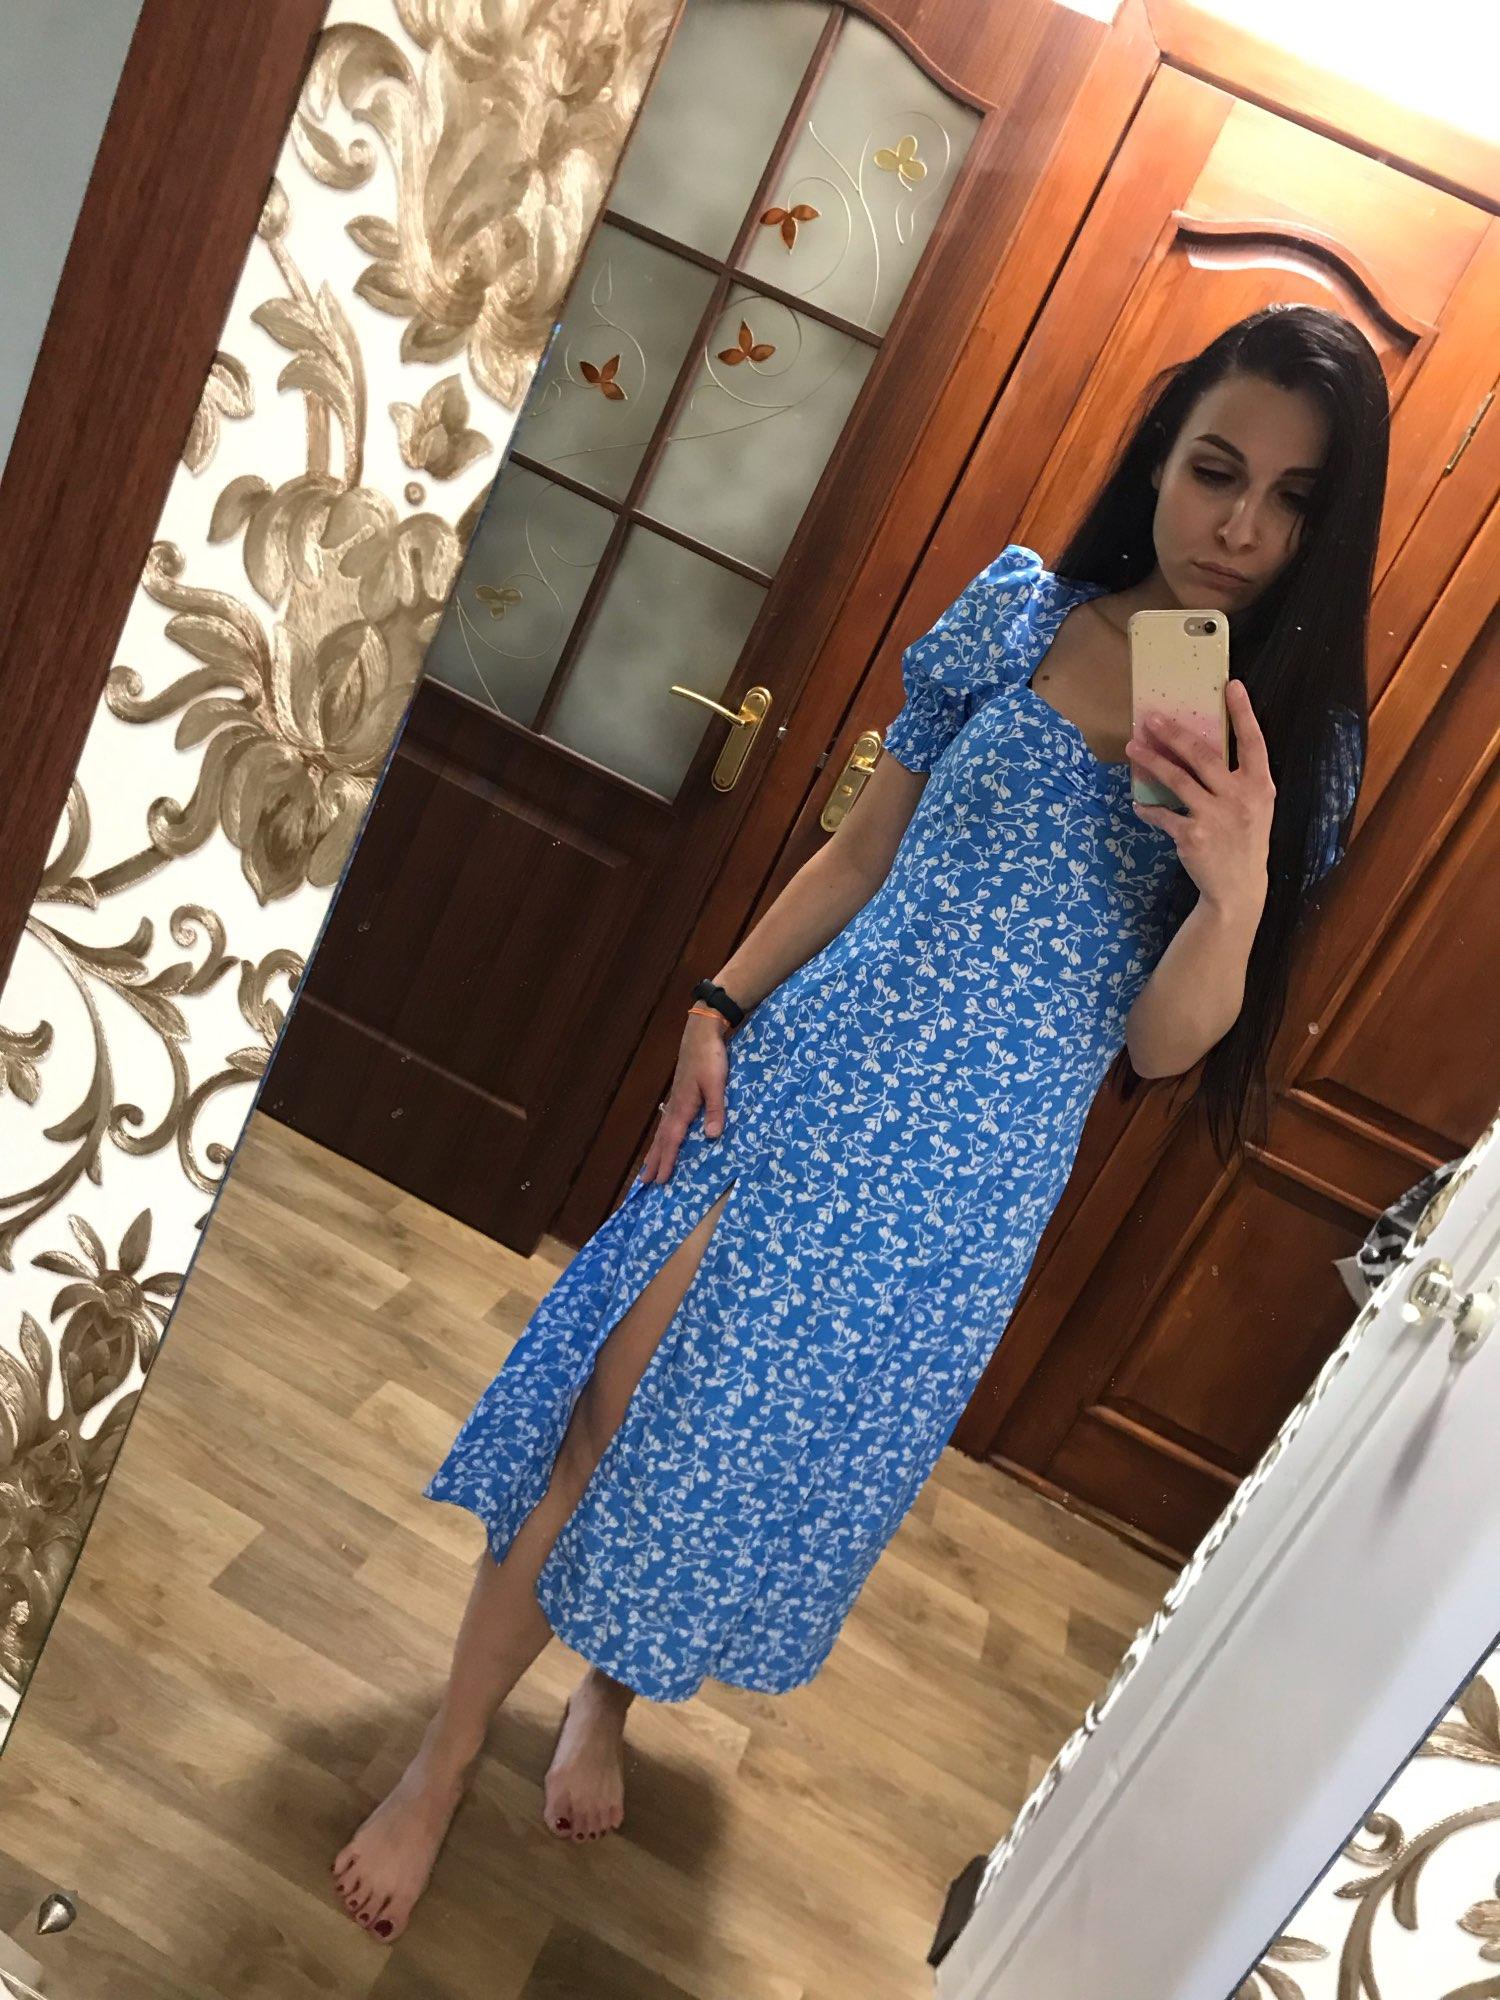 Macheda French Romance Retro Dress Women Casual Floral Print Square Collar Clothing Ruffles Puff Sleeve Midi Dresses Lady|Dresses|   - AliExpress